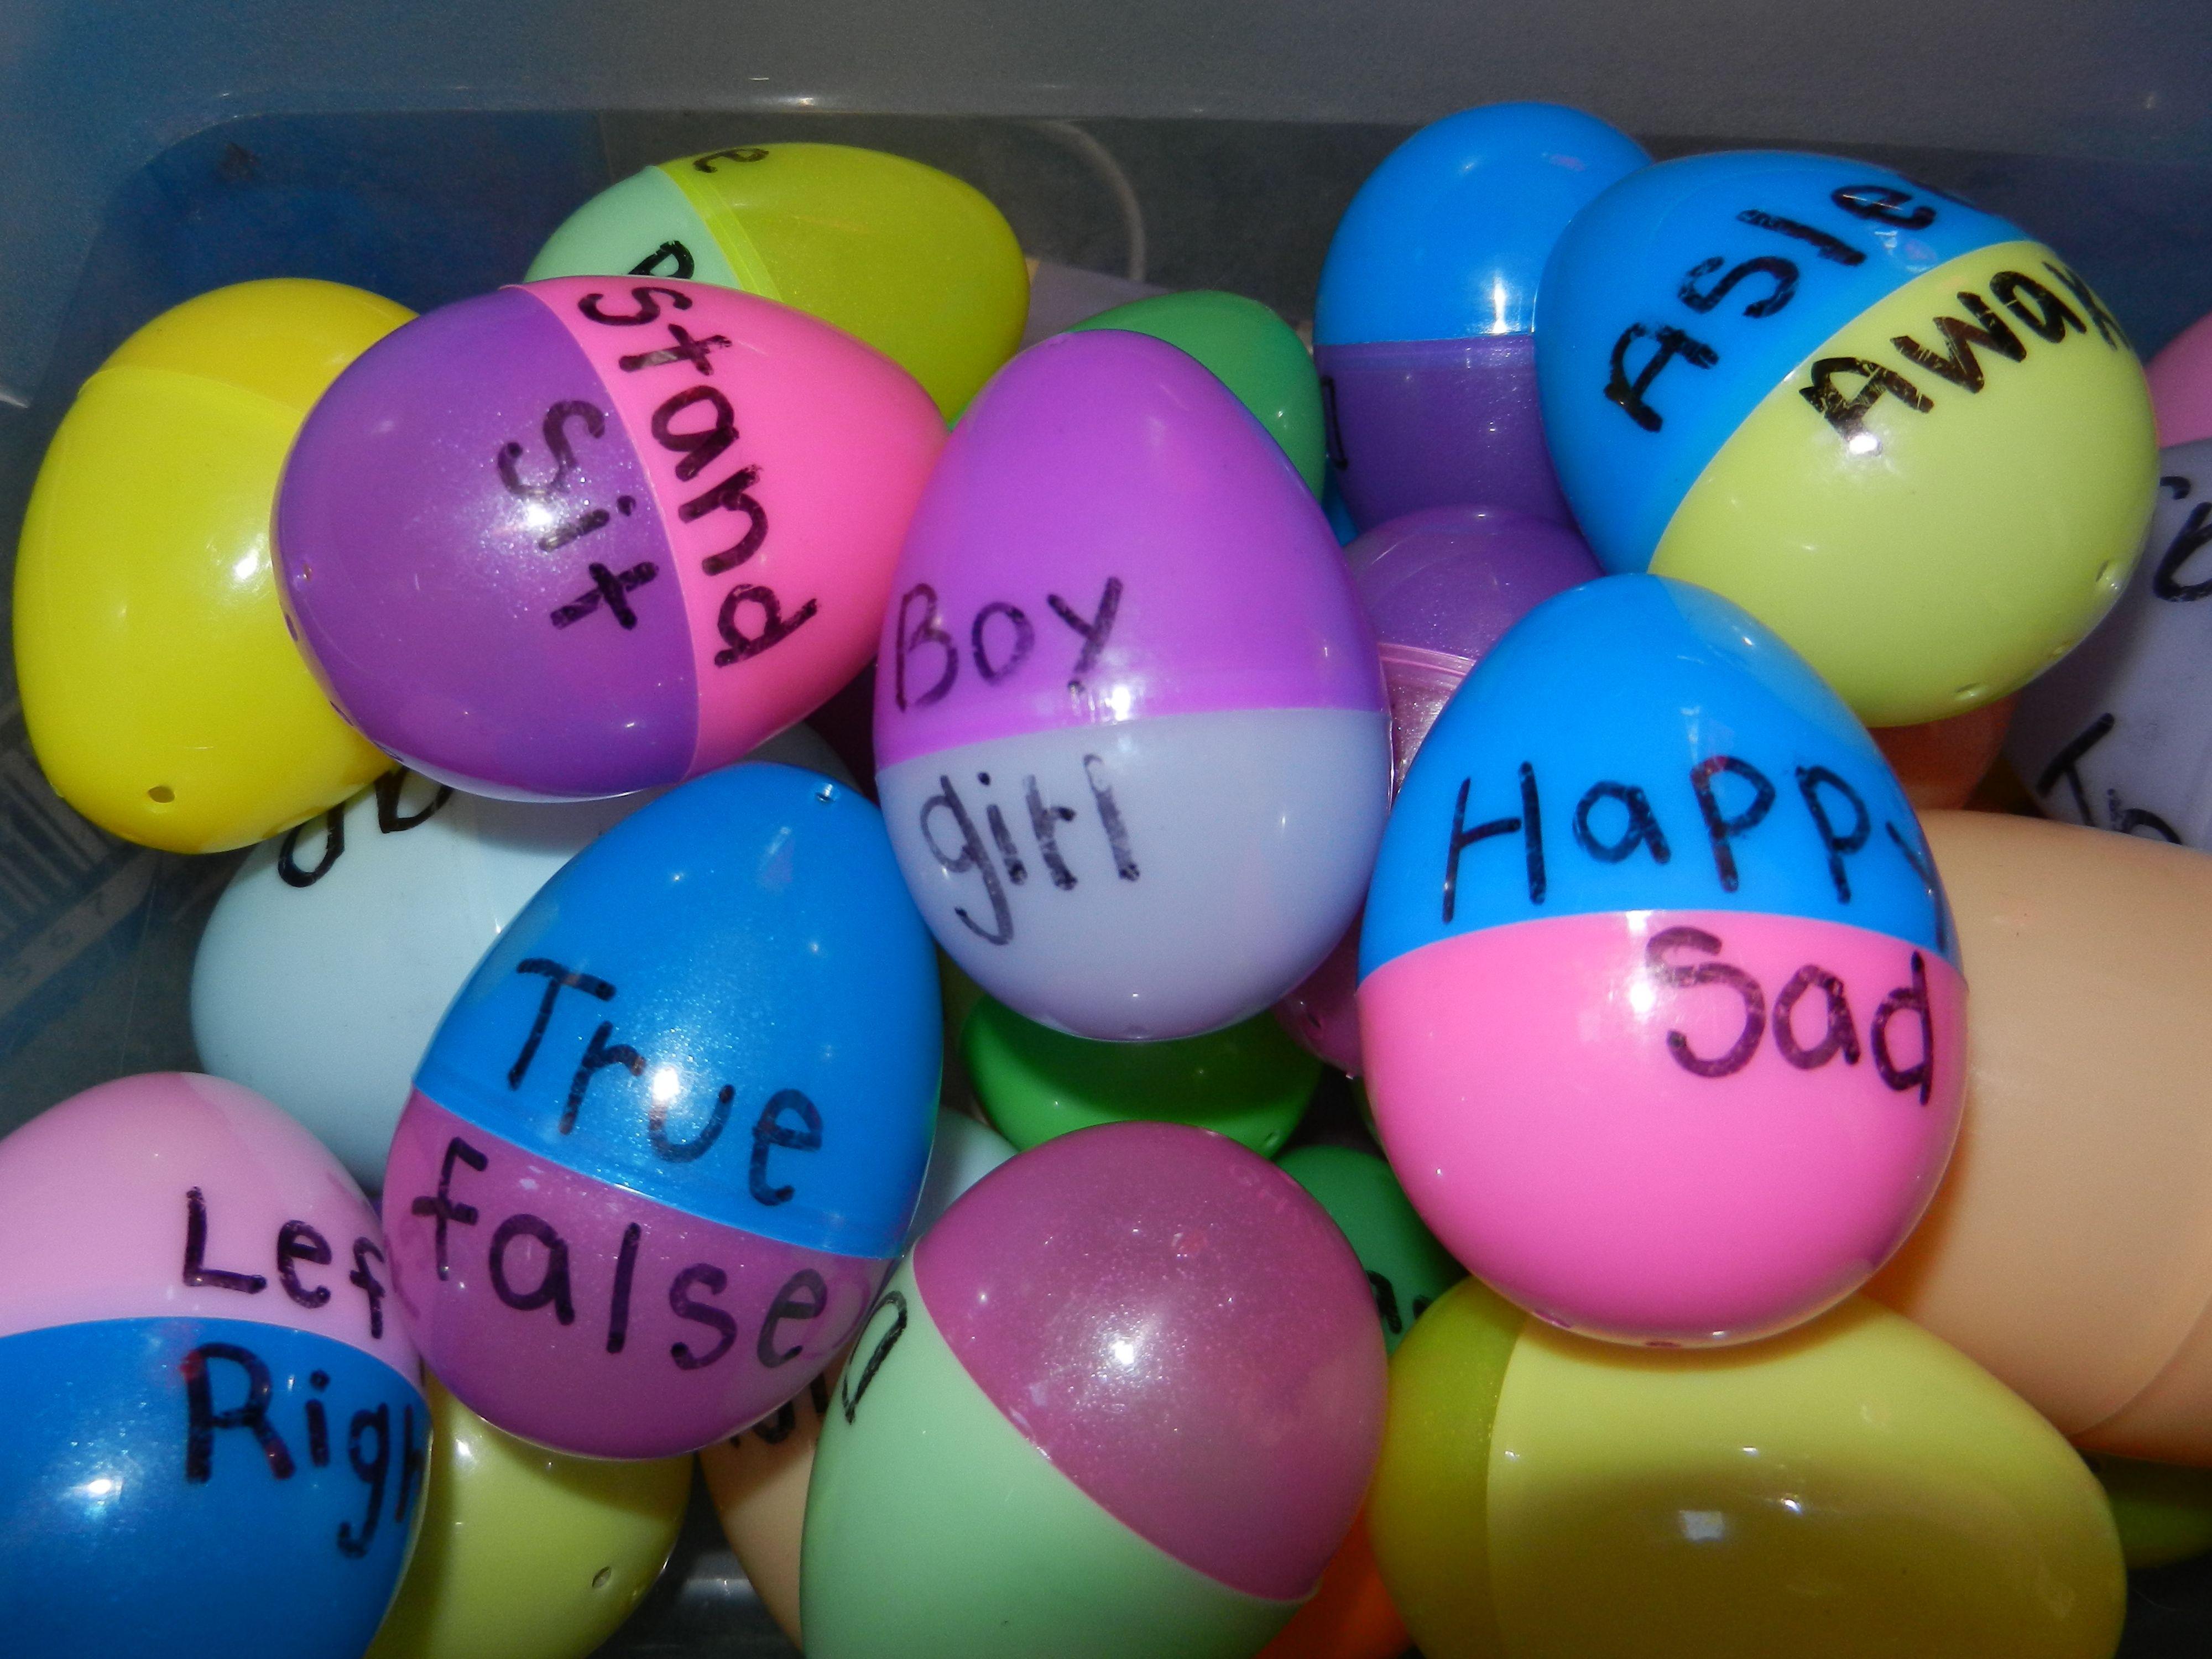 Antonym eggs write one opposite on an egg half, the other